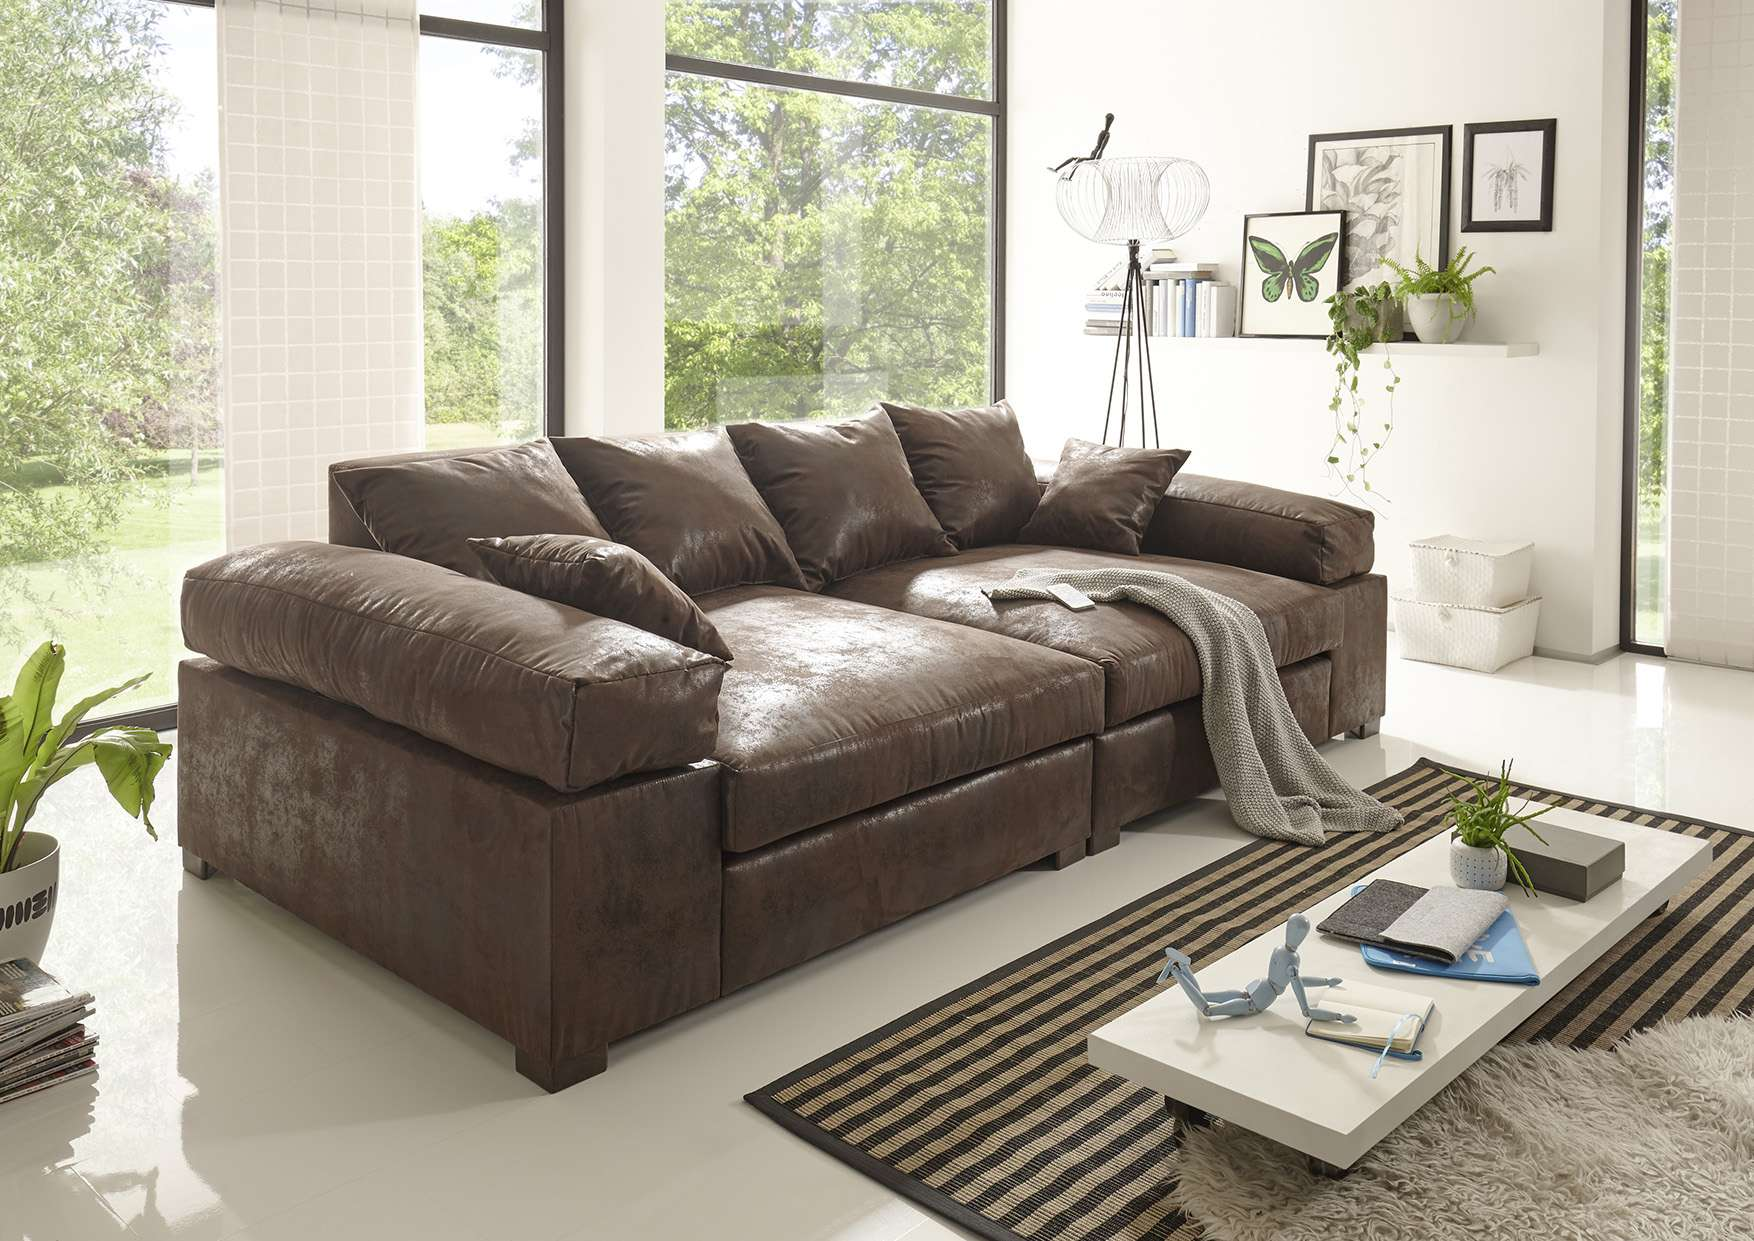 Big Sofa Couchgarnitur Megasofa Riesensofa AREZZO Vintage Braun